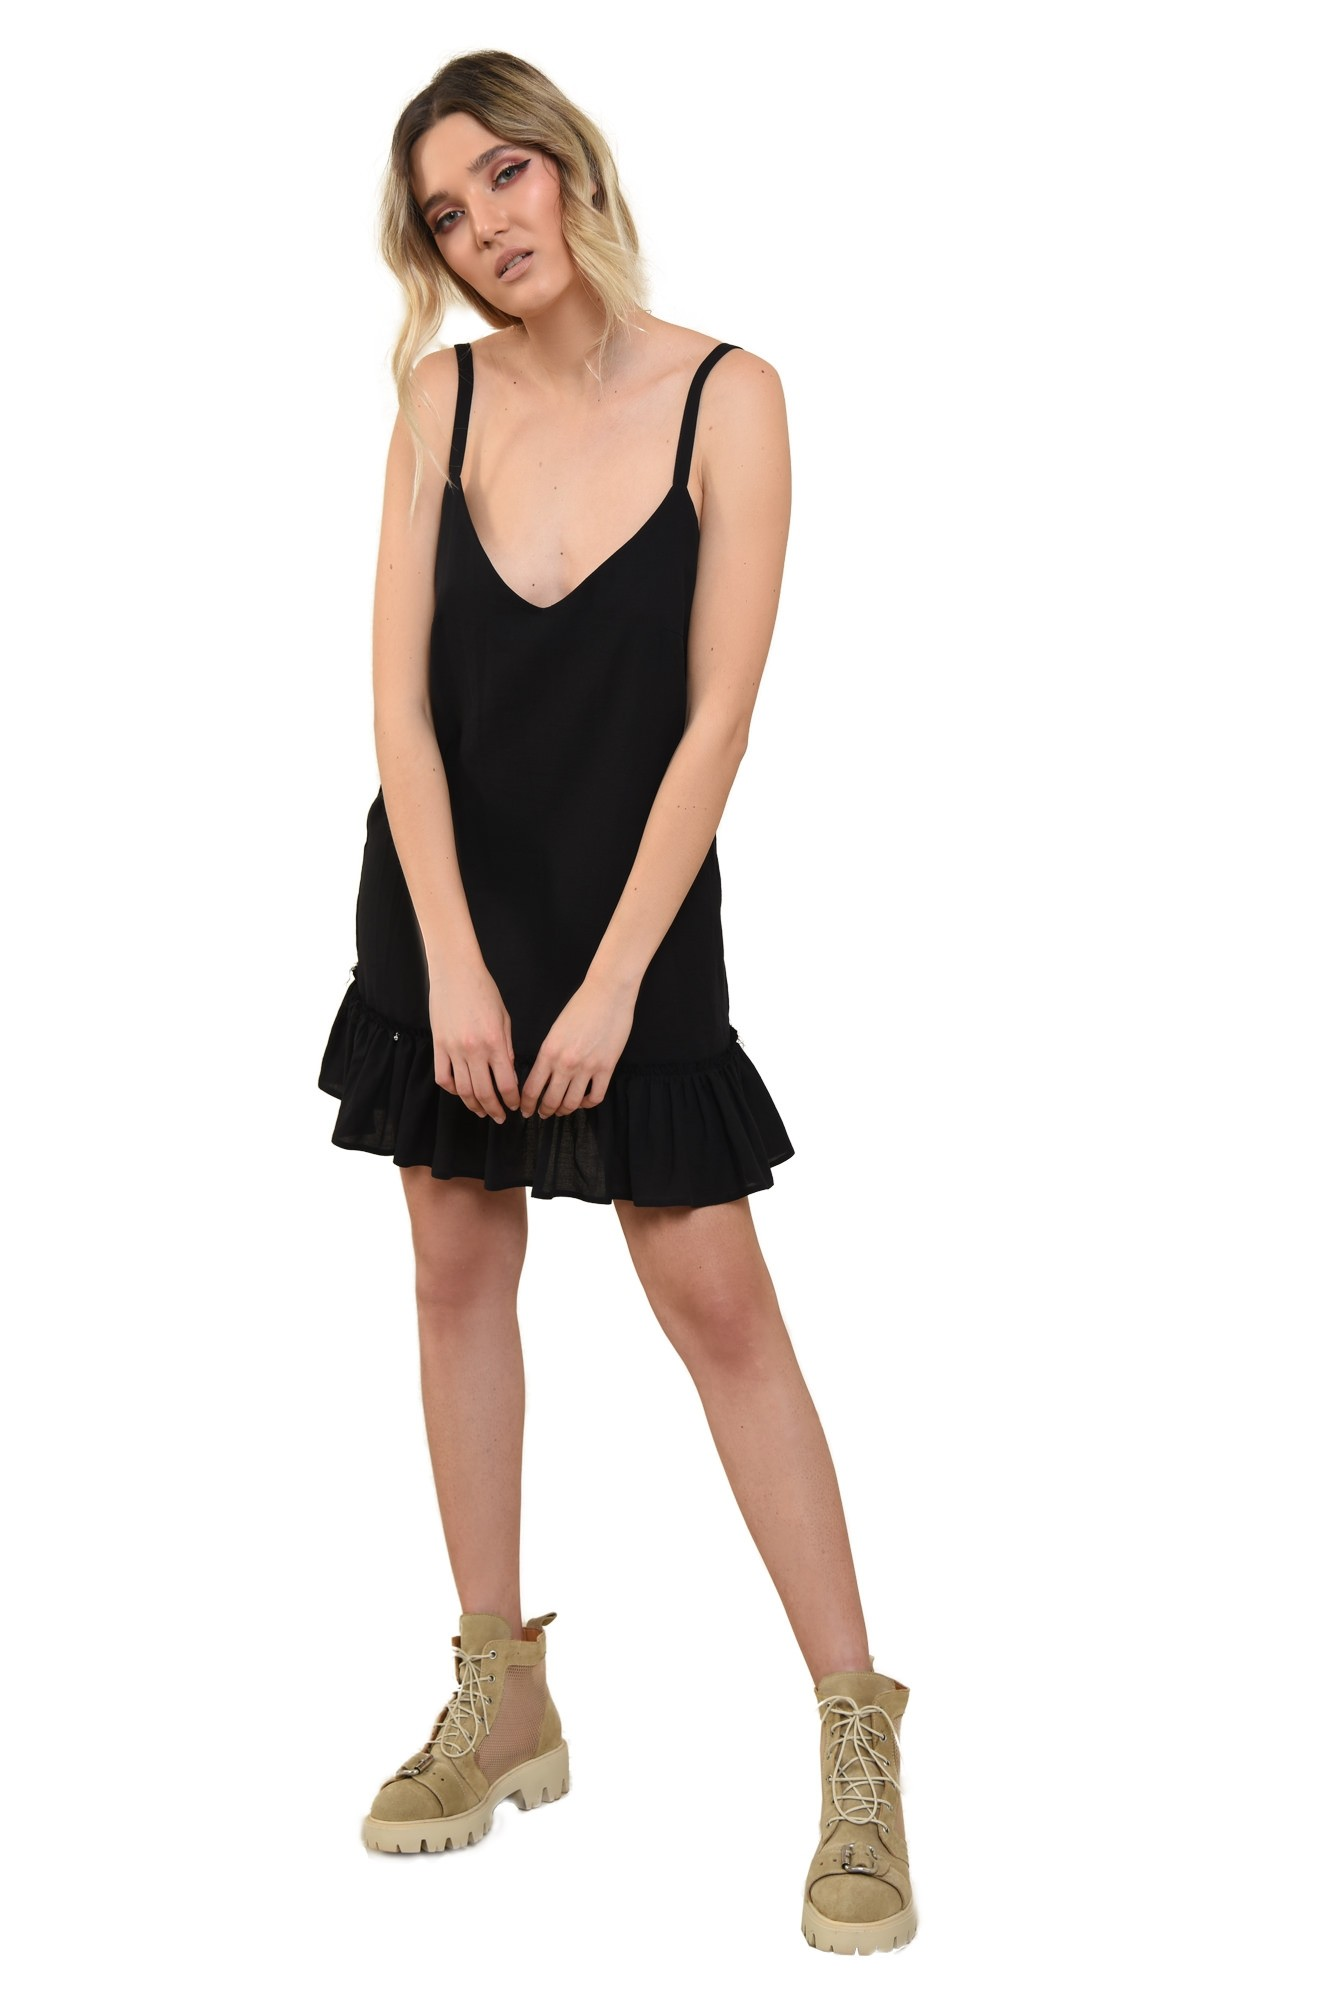 3 - 360 -  rochie lejera, cu bretele fine, evazata, scurta, rochie de vara